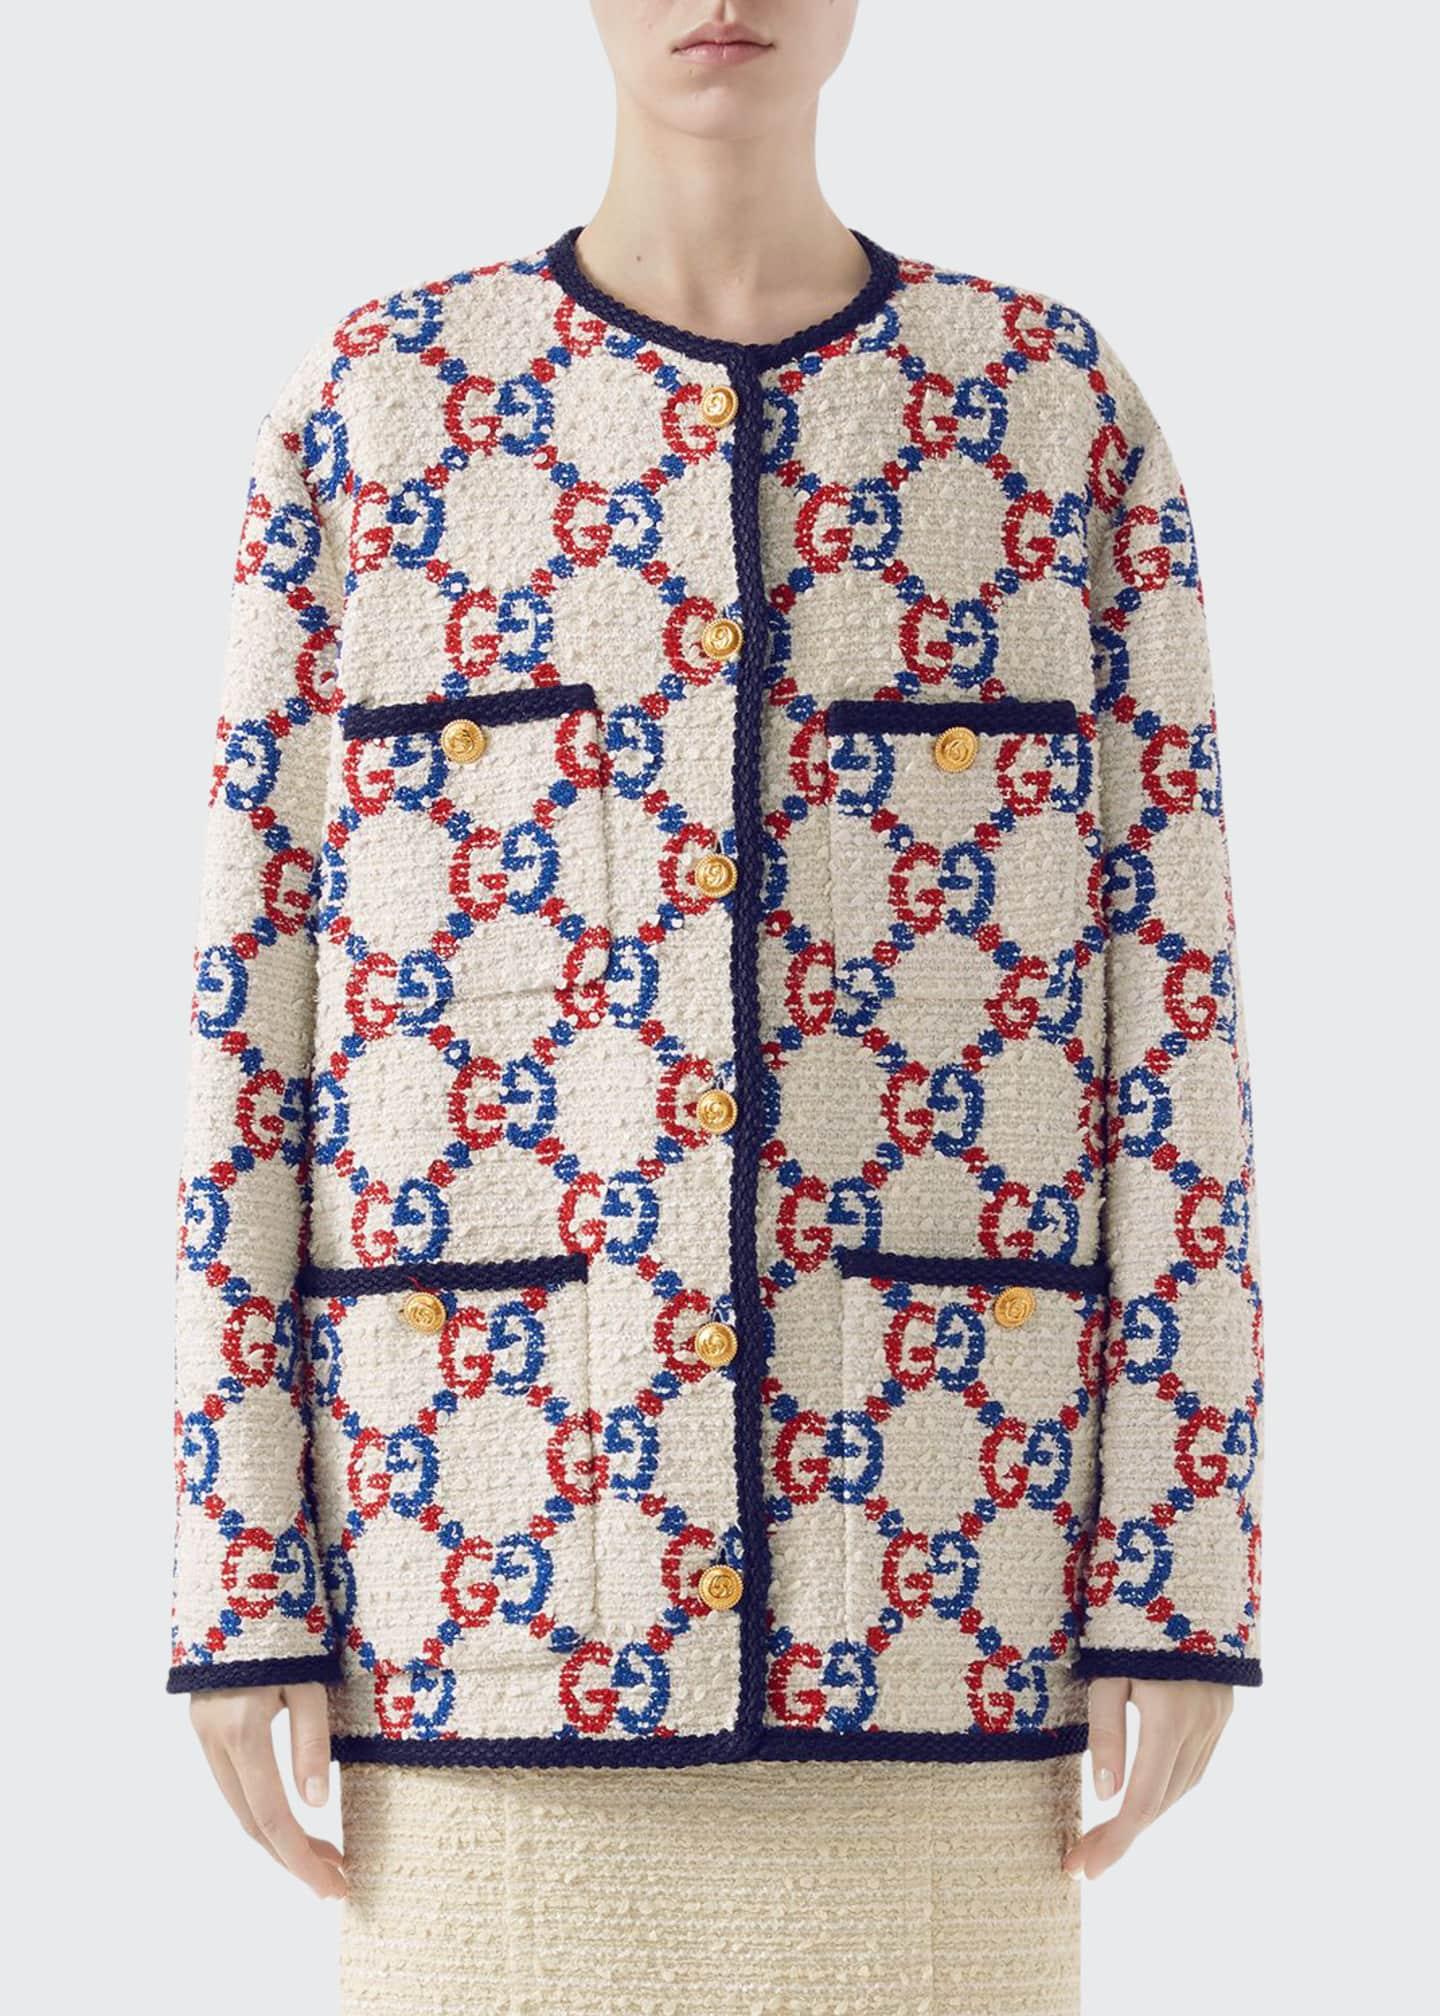 Gucci GG-Jacquard Tweed Jacket